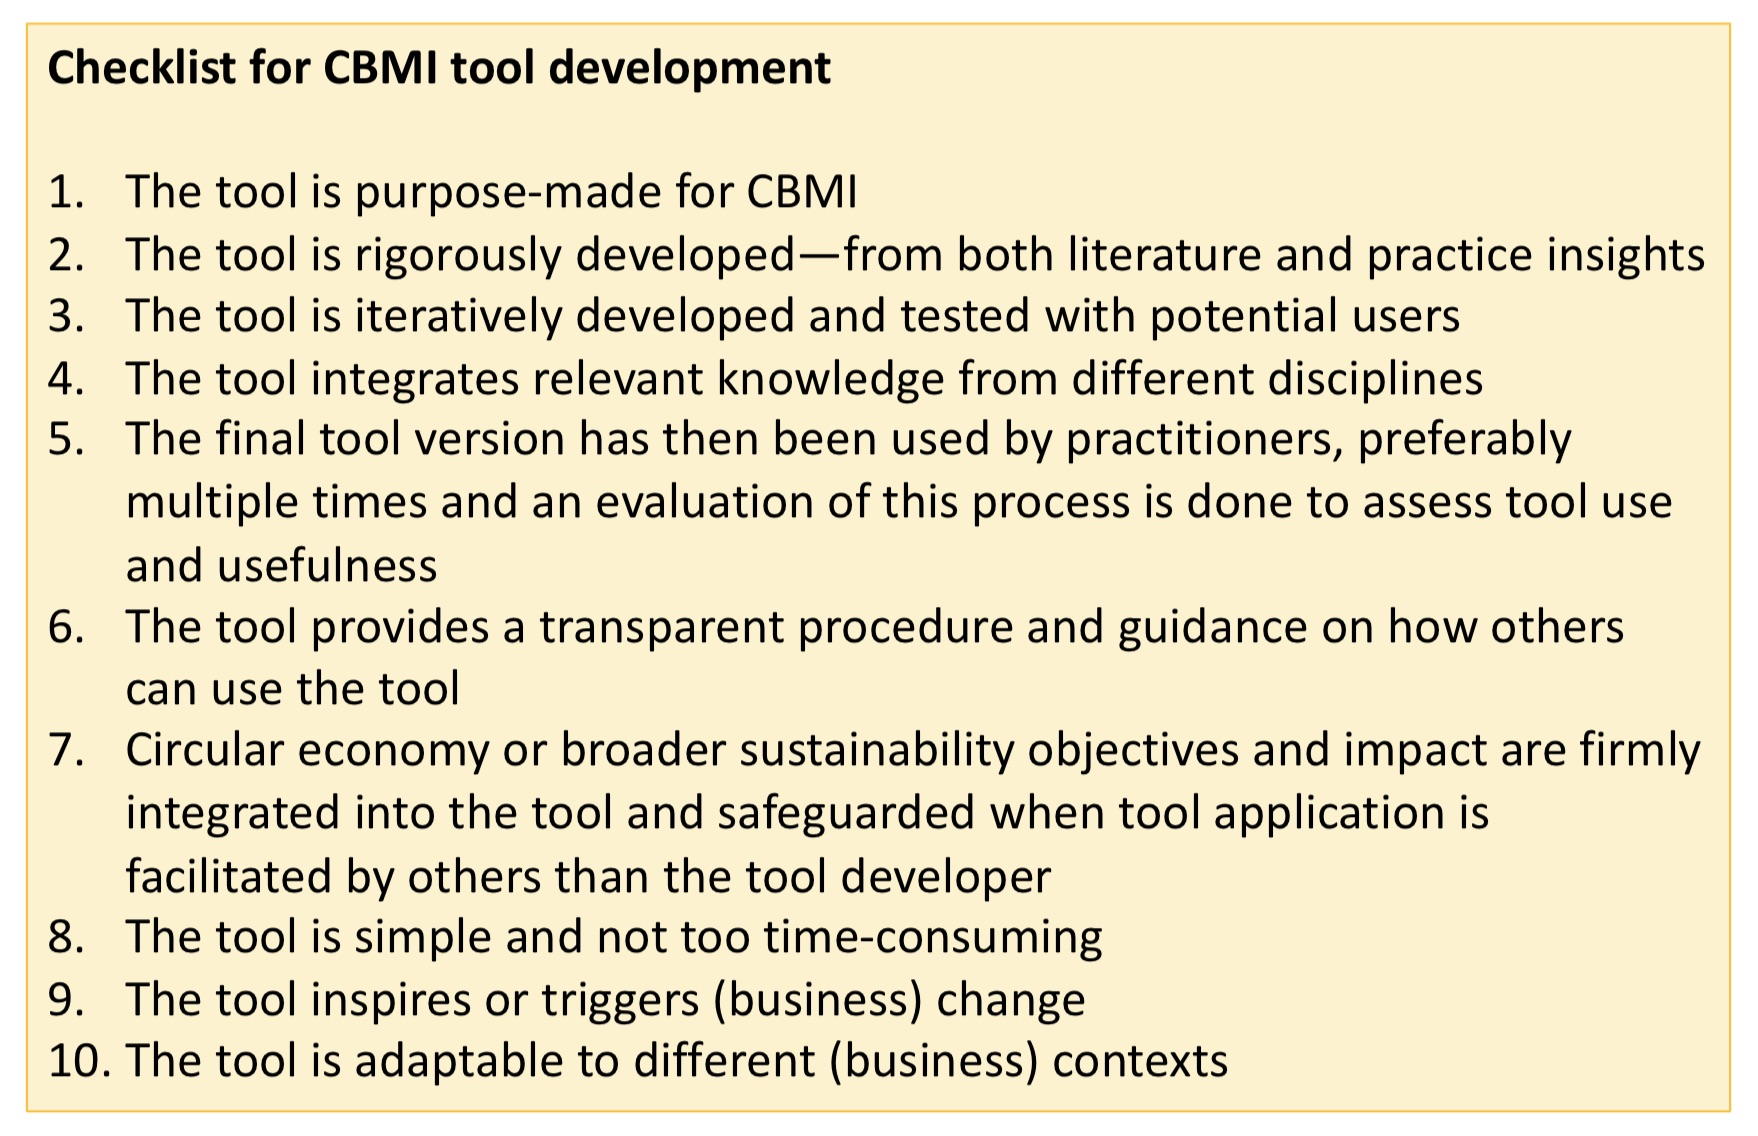 Checklist for tool CBMI development